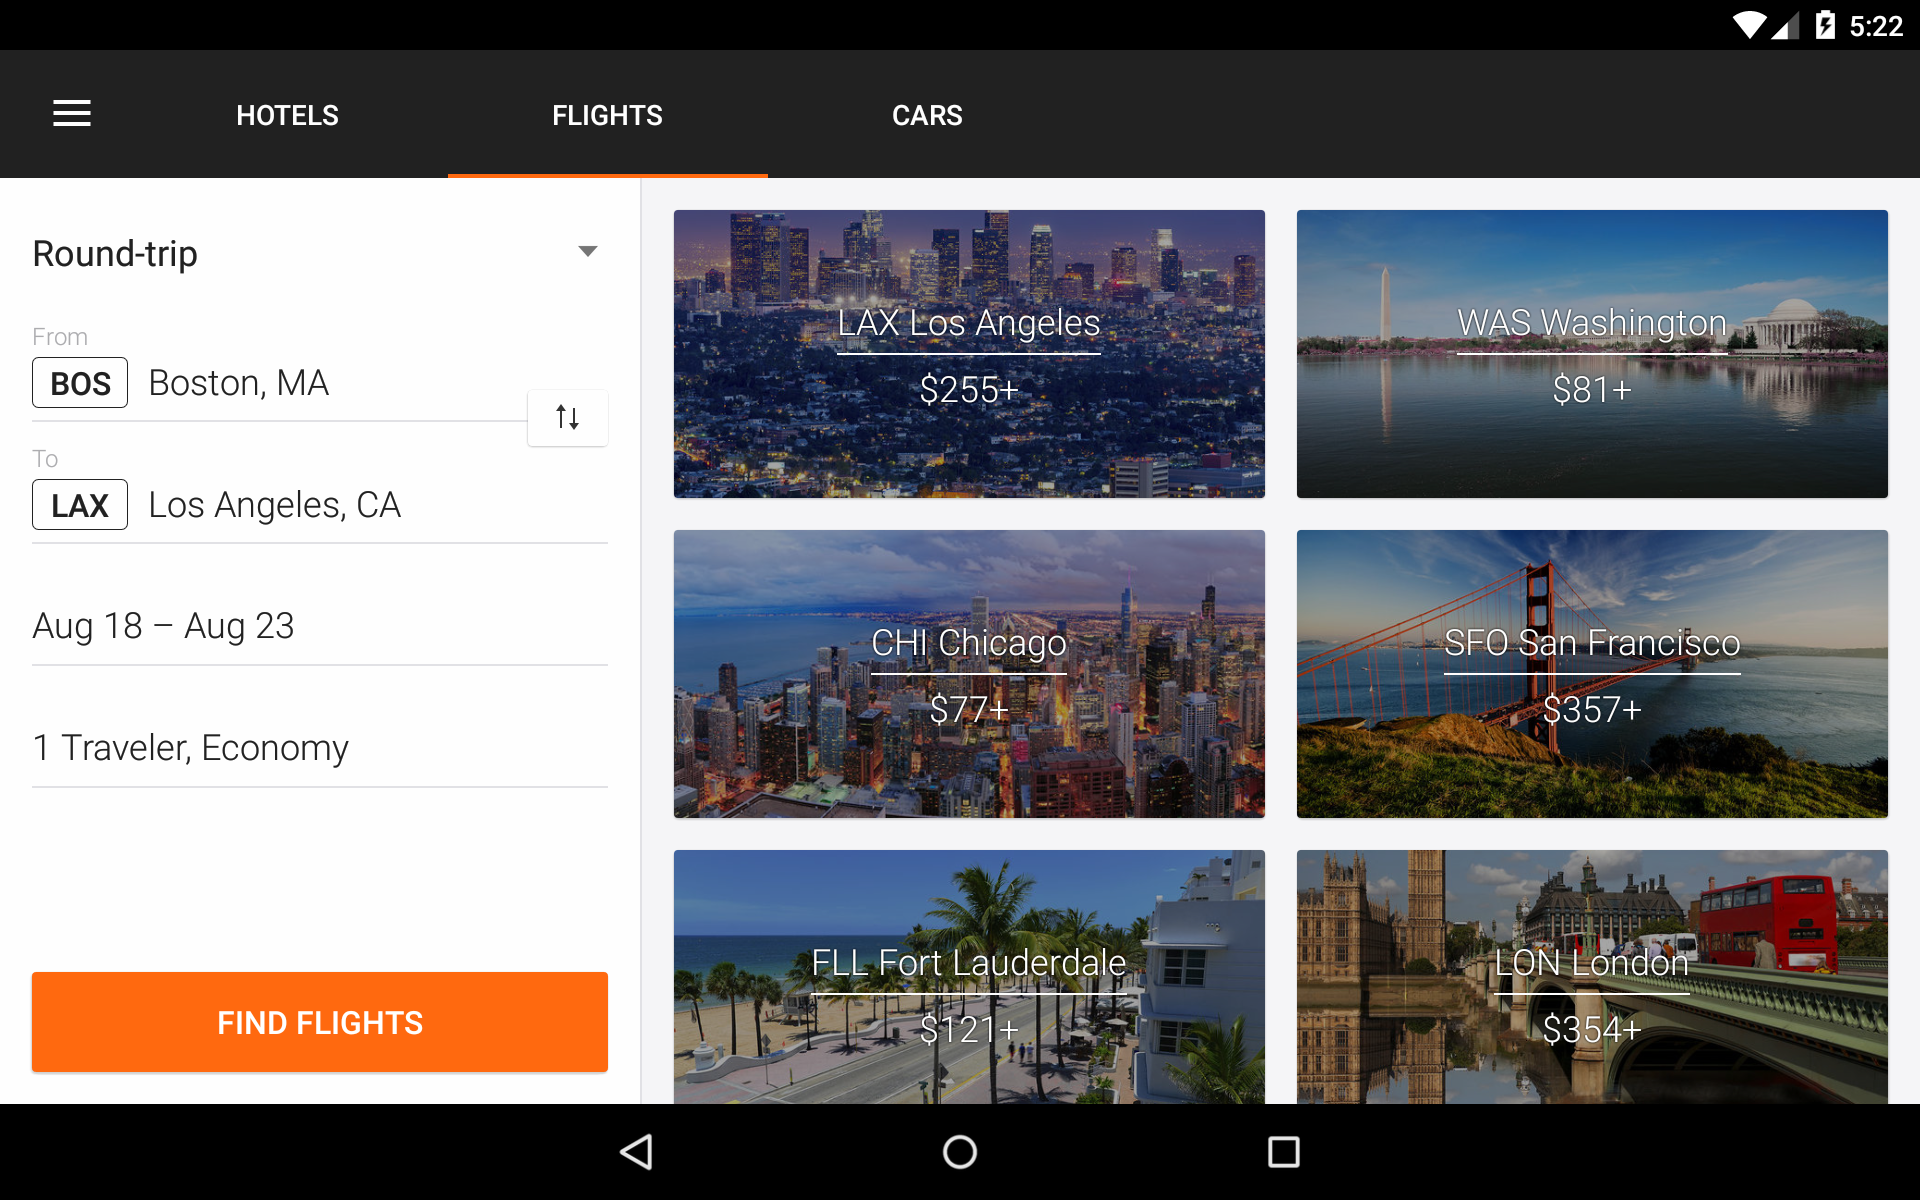 KAYAK Flights, Hotels & Cars screenshot #15